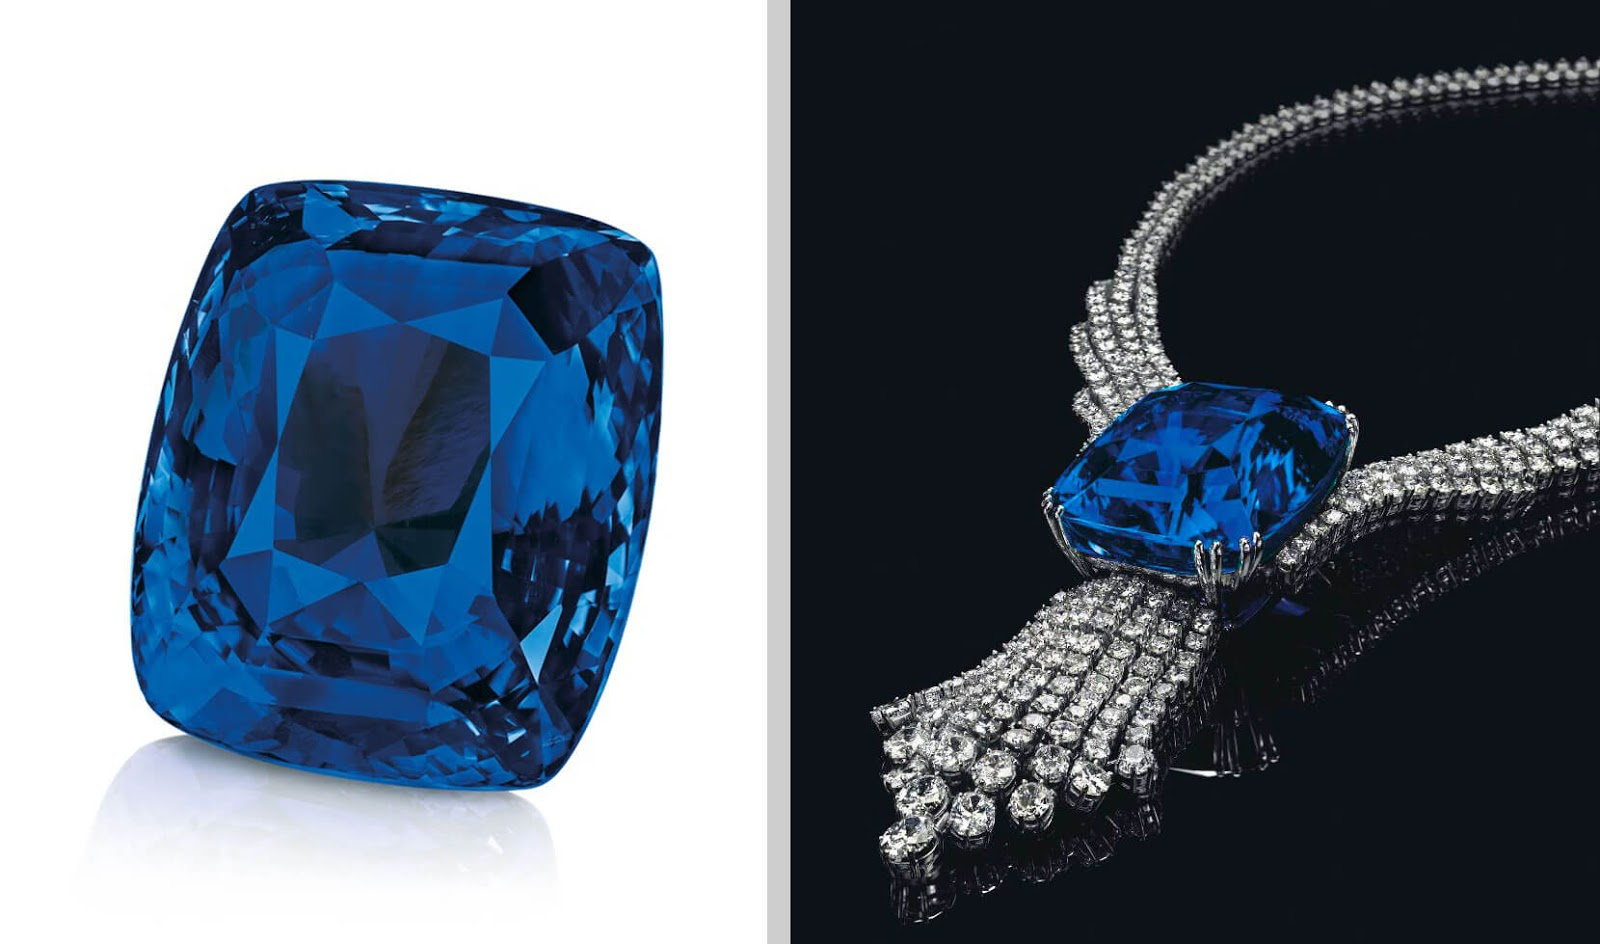 392.52 carat 'Blue Belle of Asia' Sapphire